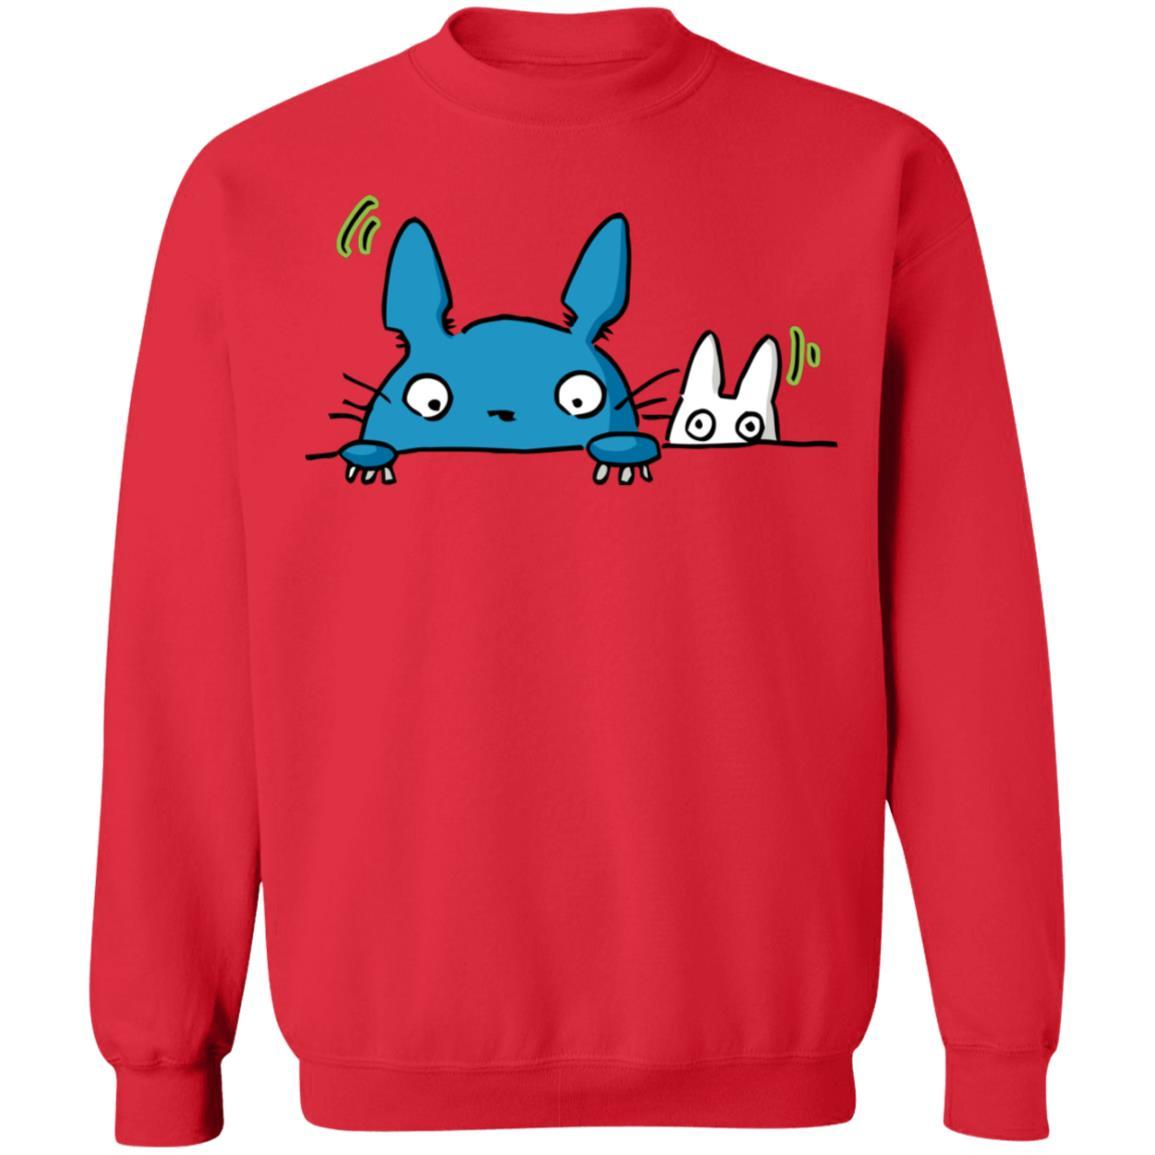 Mini Twins Totoro Sweatshirt Unisex